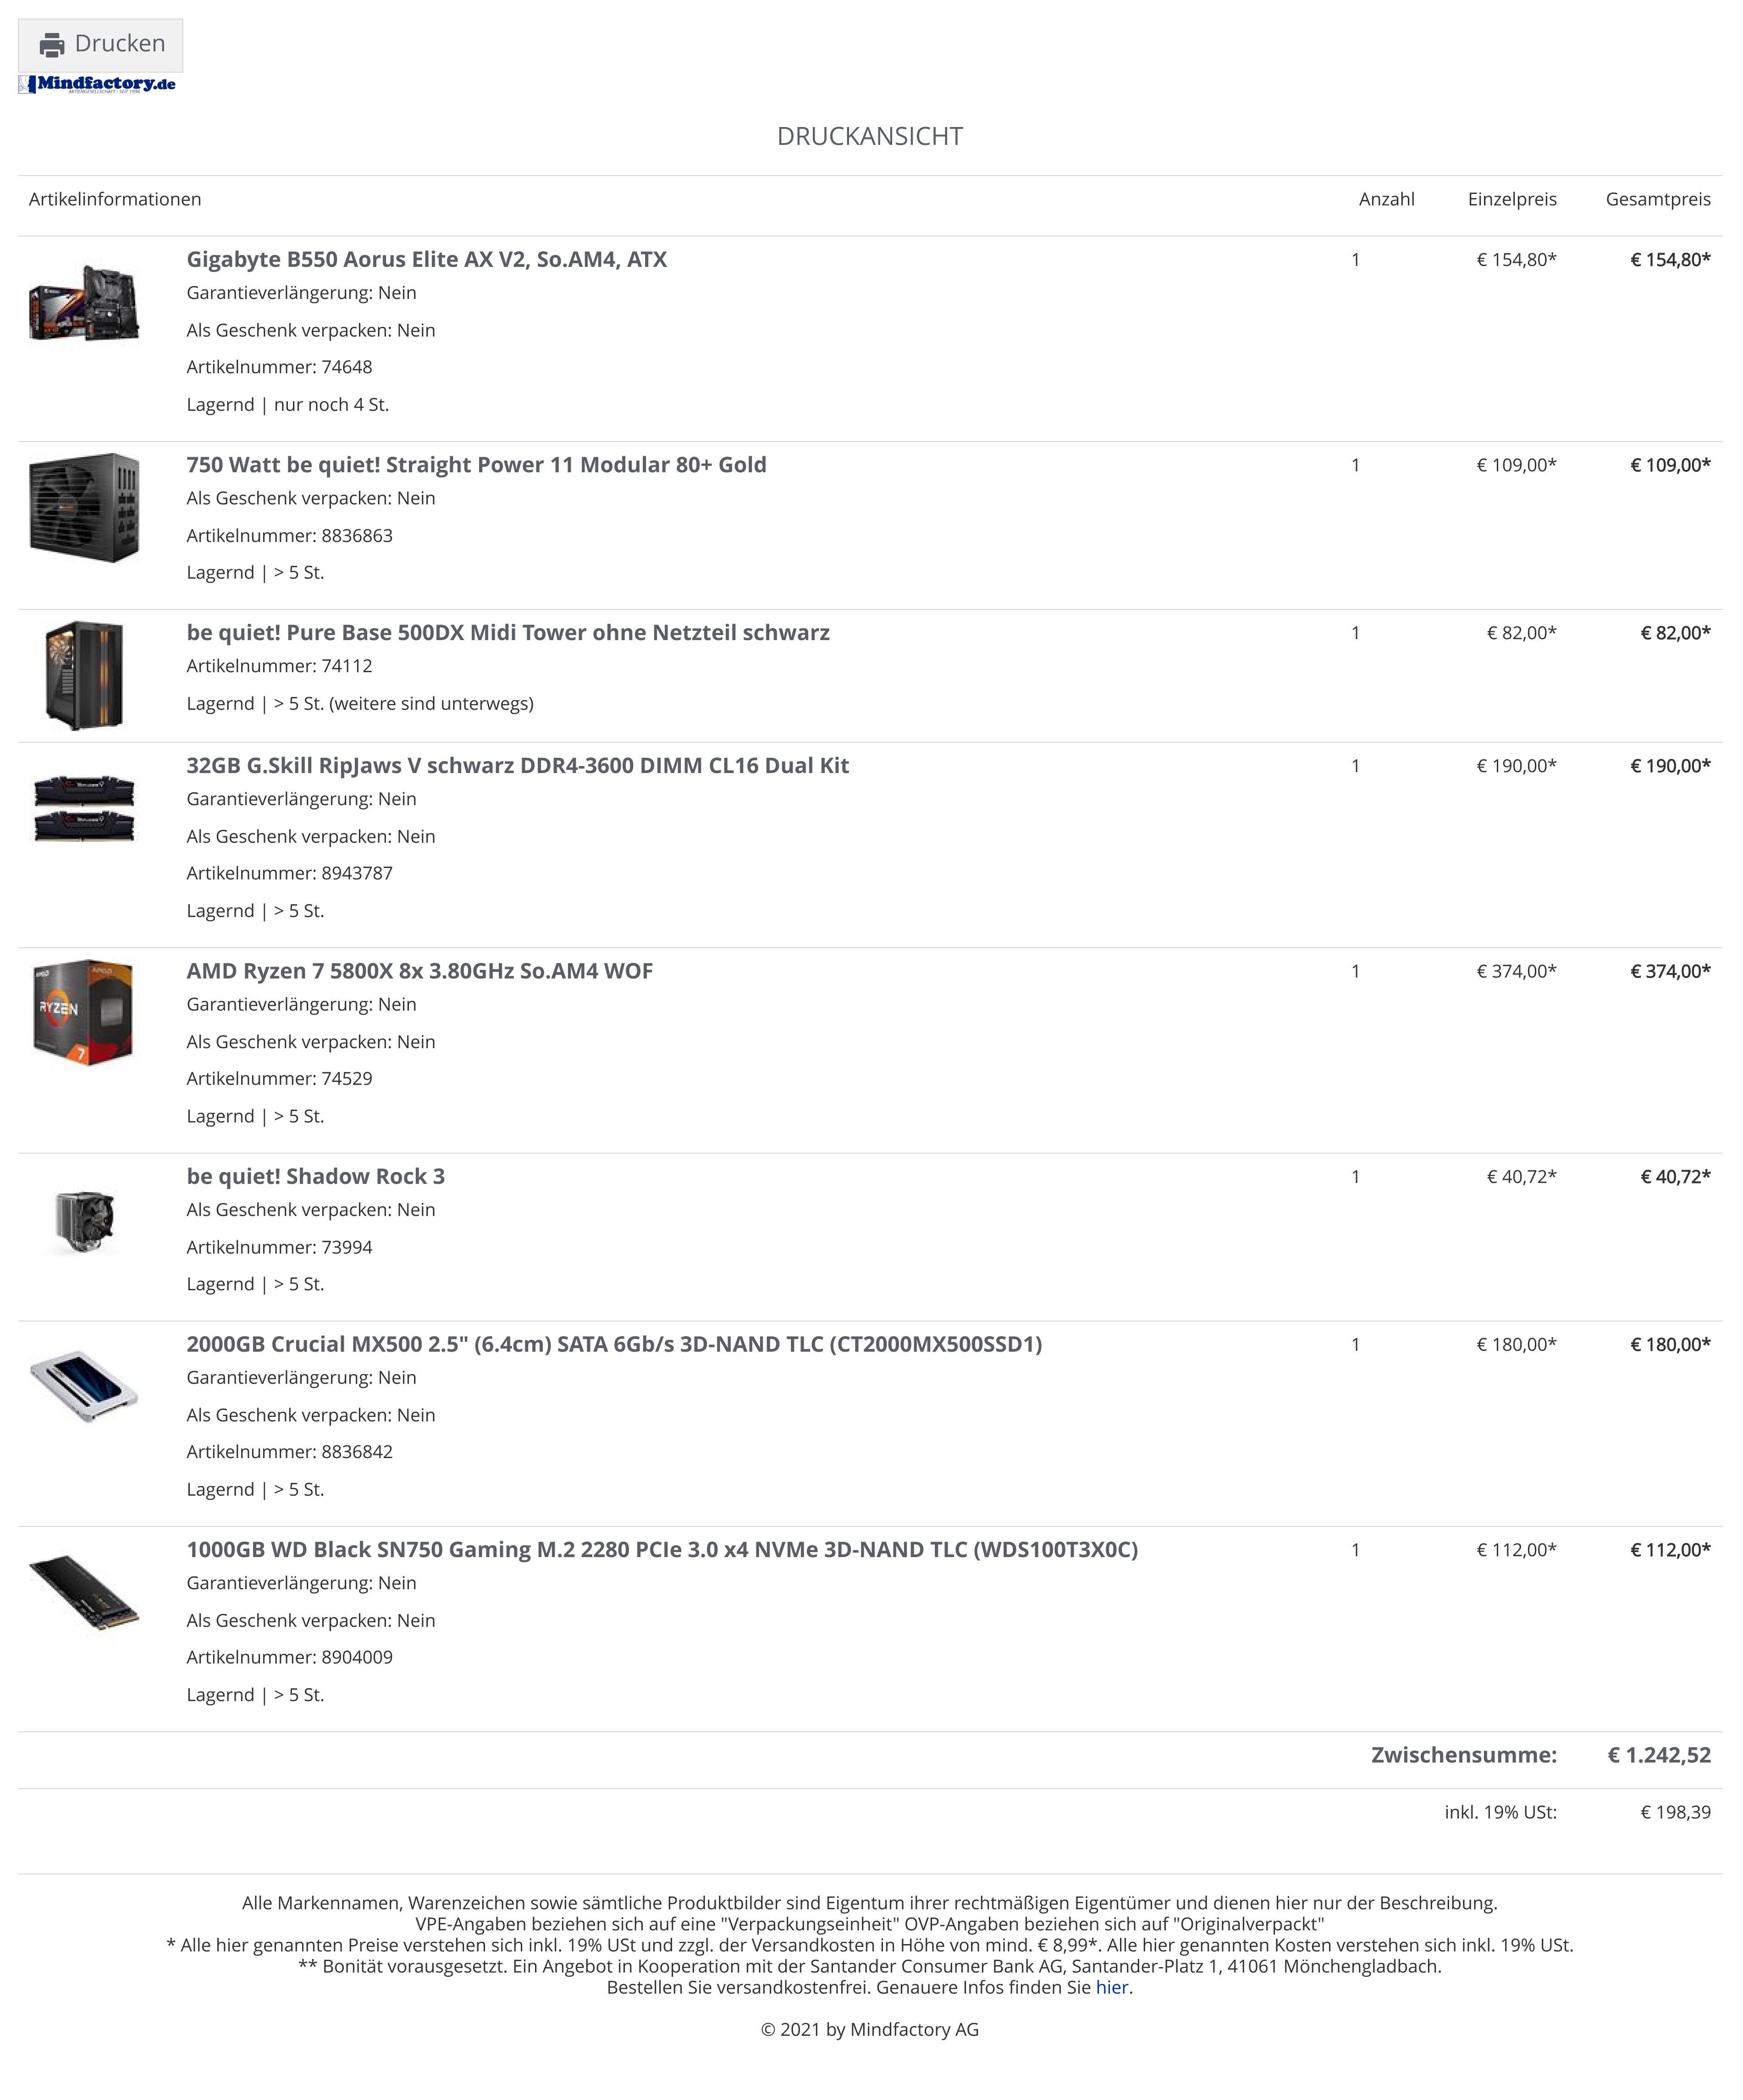 Hardware, Notebooks & Software bei Mindfactory.de kaufen.png